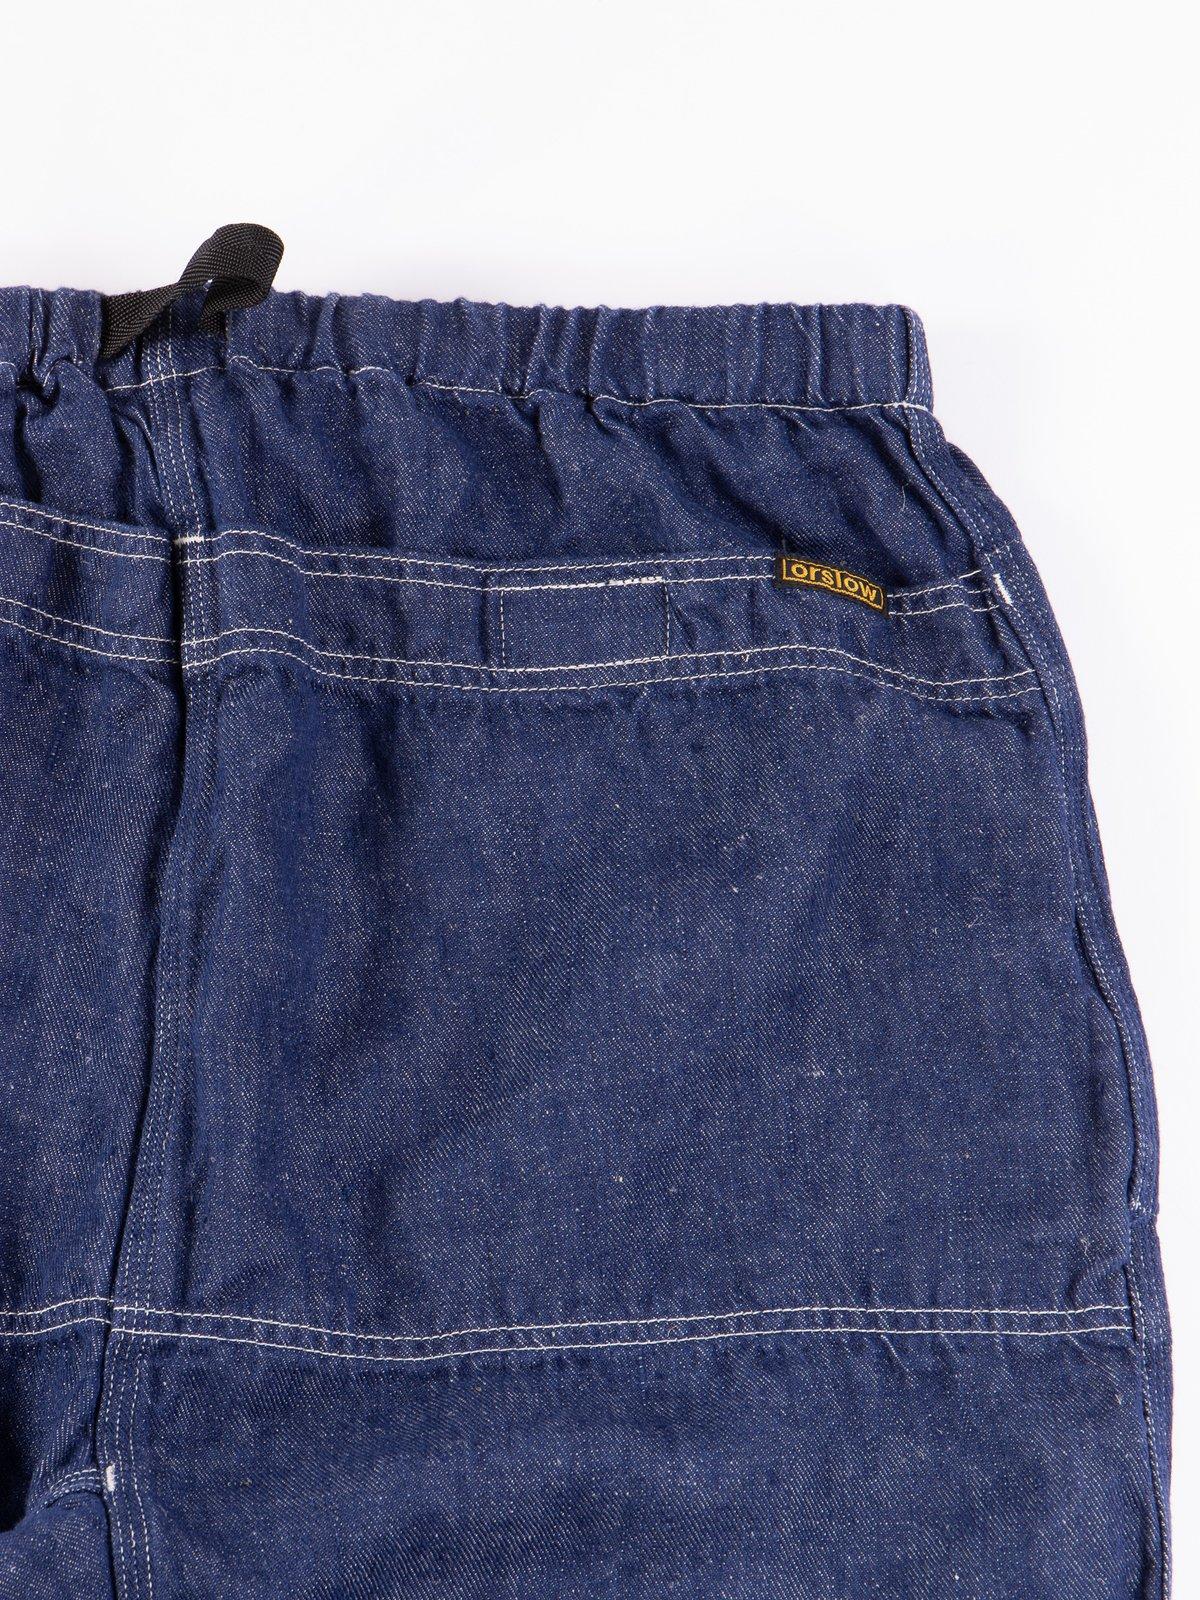 One Wash Linen Denim Climbing Pant - Image 7